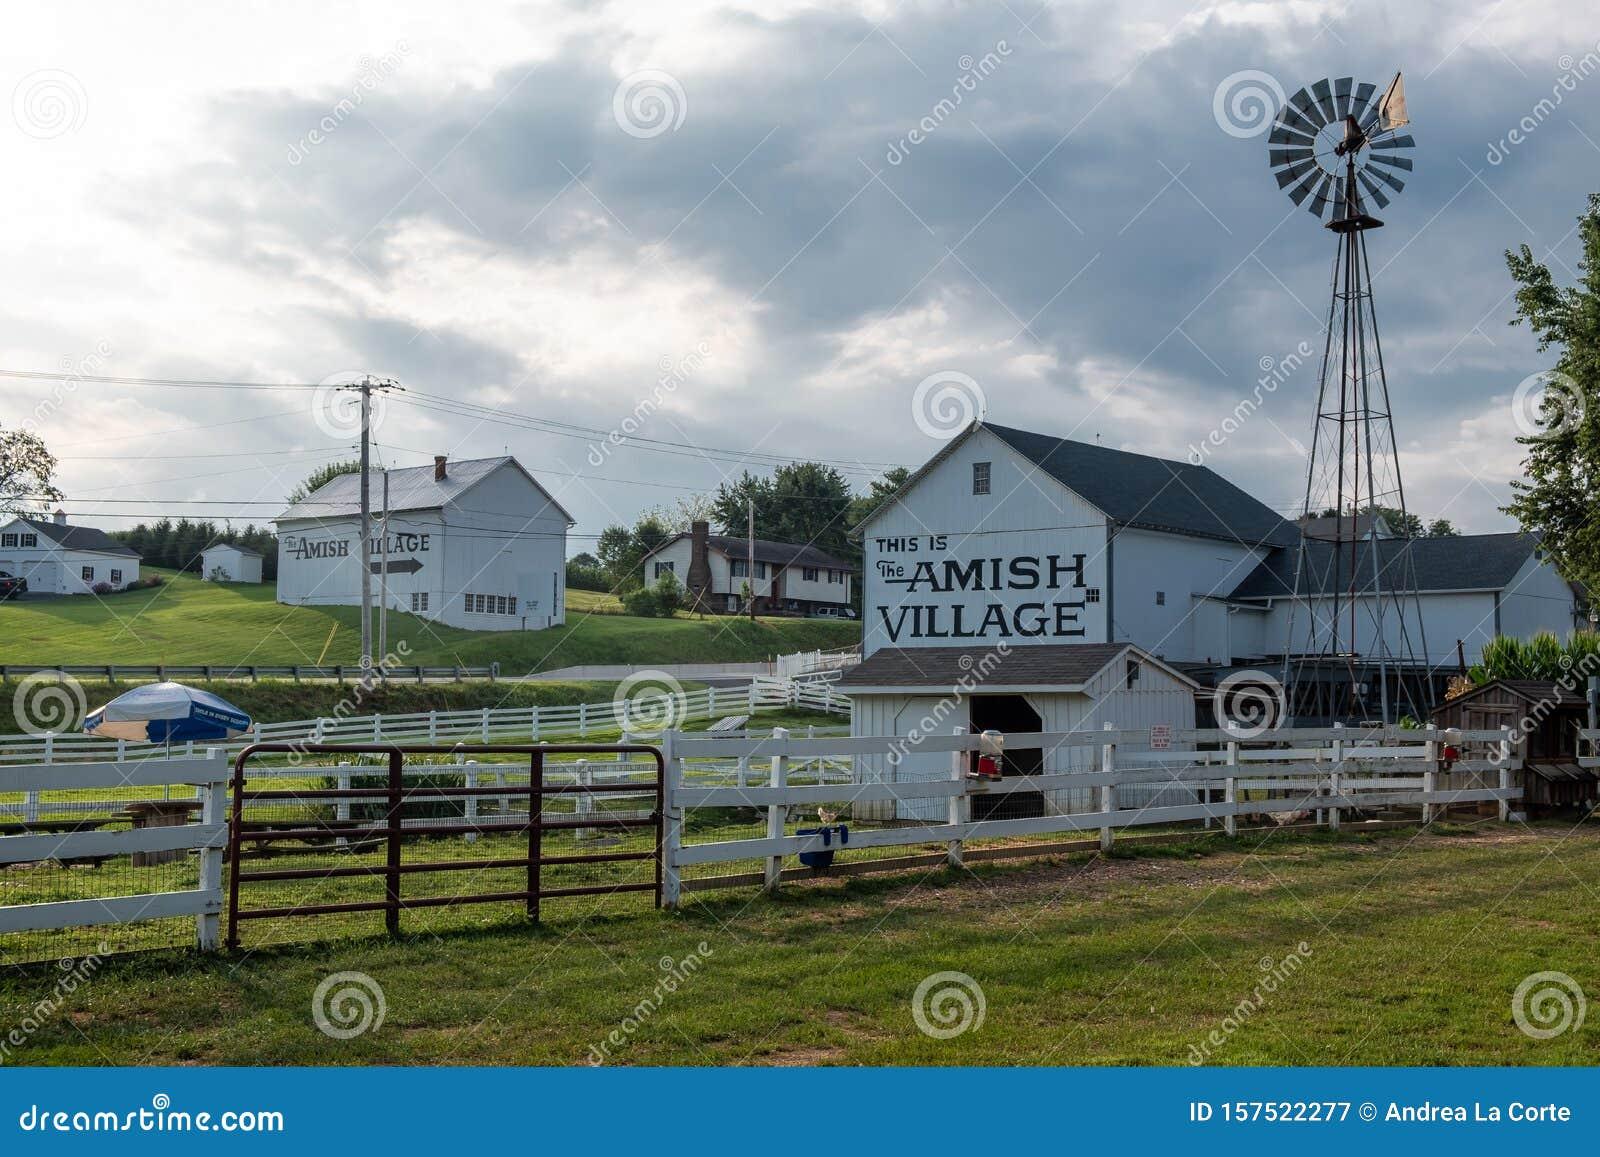 Amish Village building, Pennsylvania